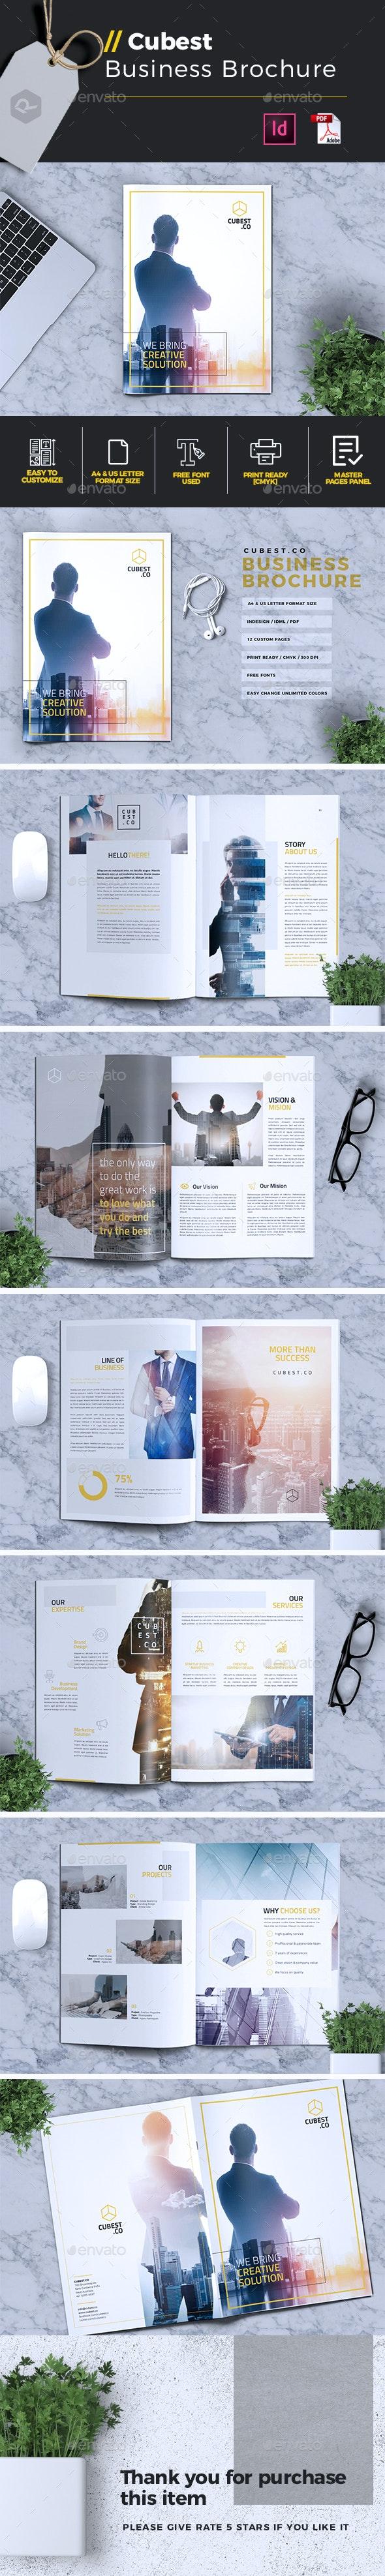 Cubest | Business Brochure - Corporate Brochures